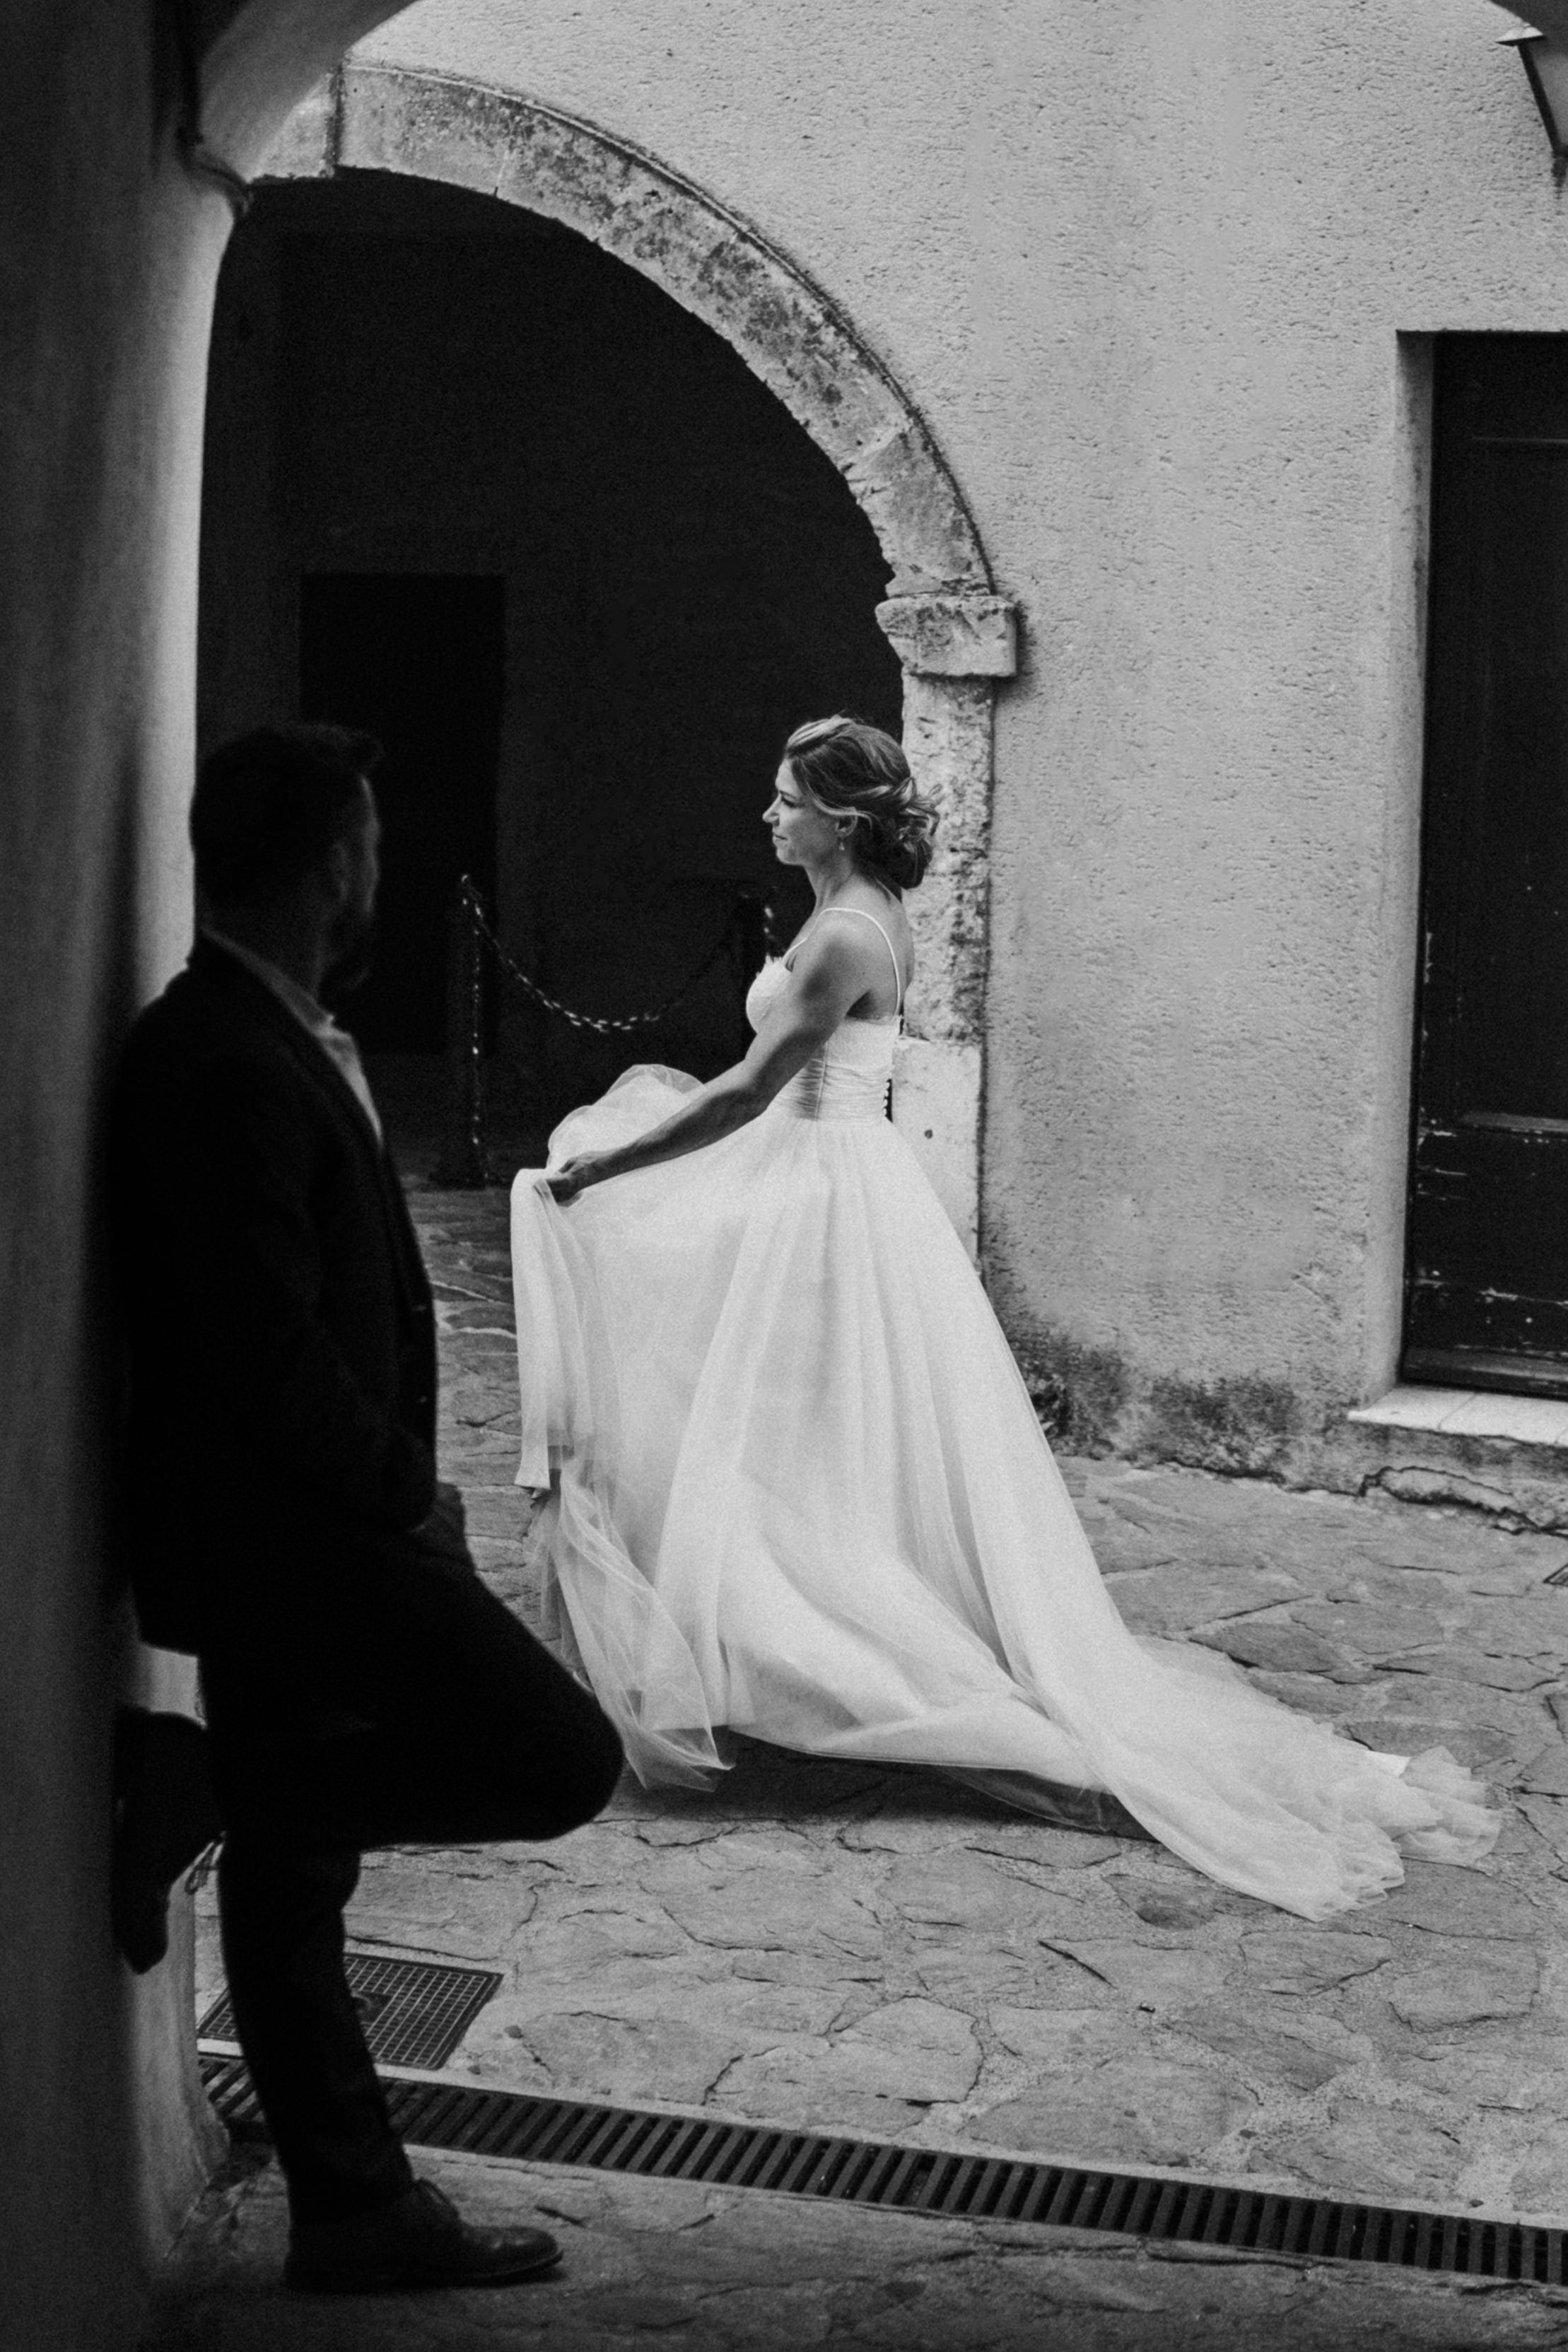 english photographer in france, wedding photographer saint tropez, romantic wedding photography france, chateau wedding france, cote d'azur wedding photographer, ramatuelle wedding (21).jpg